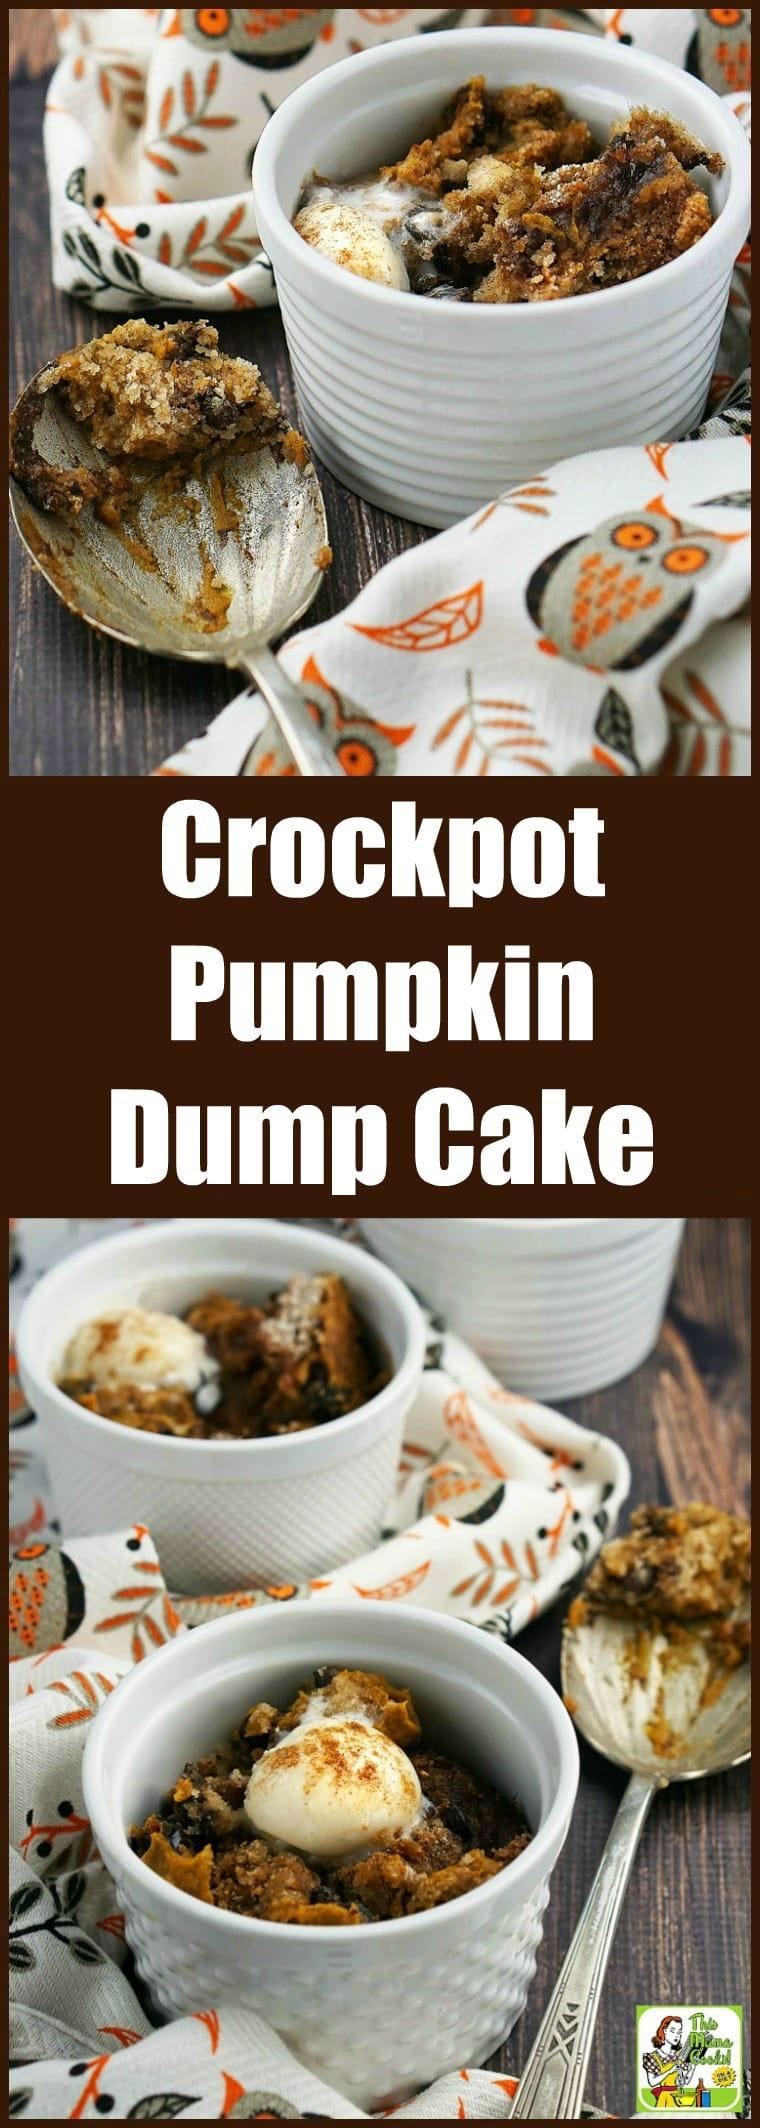 Crockpot Pumpkin Dump Cake Recipe